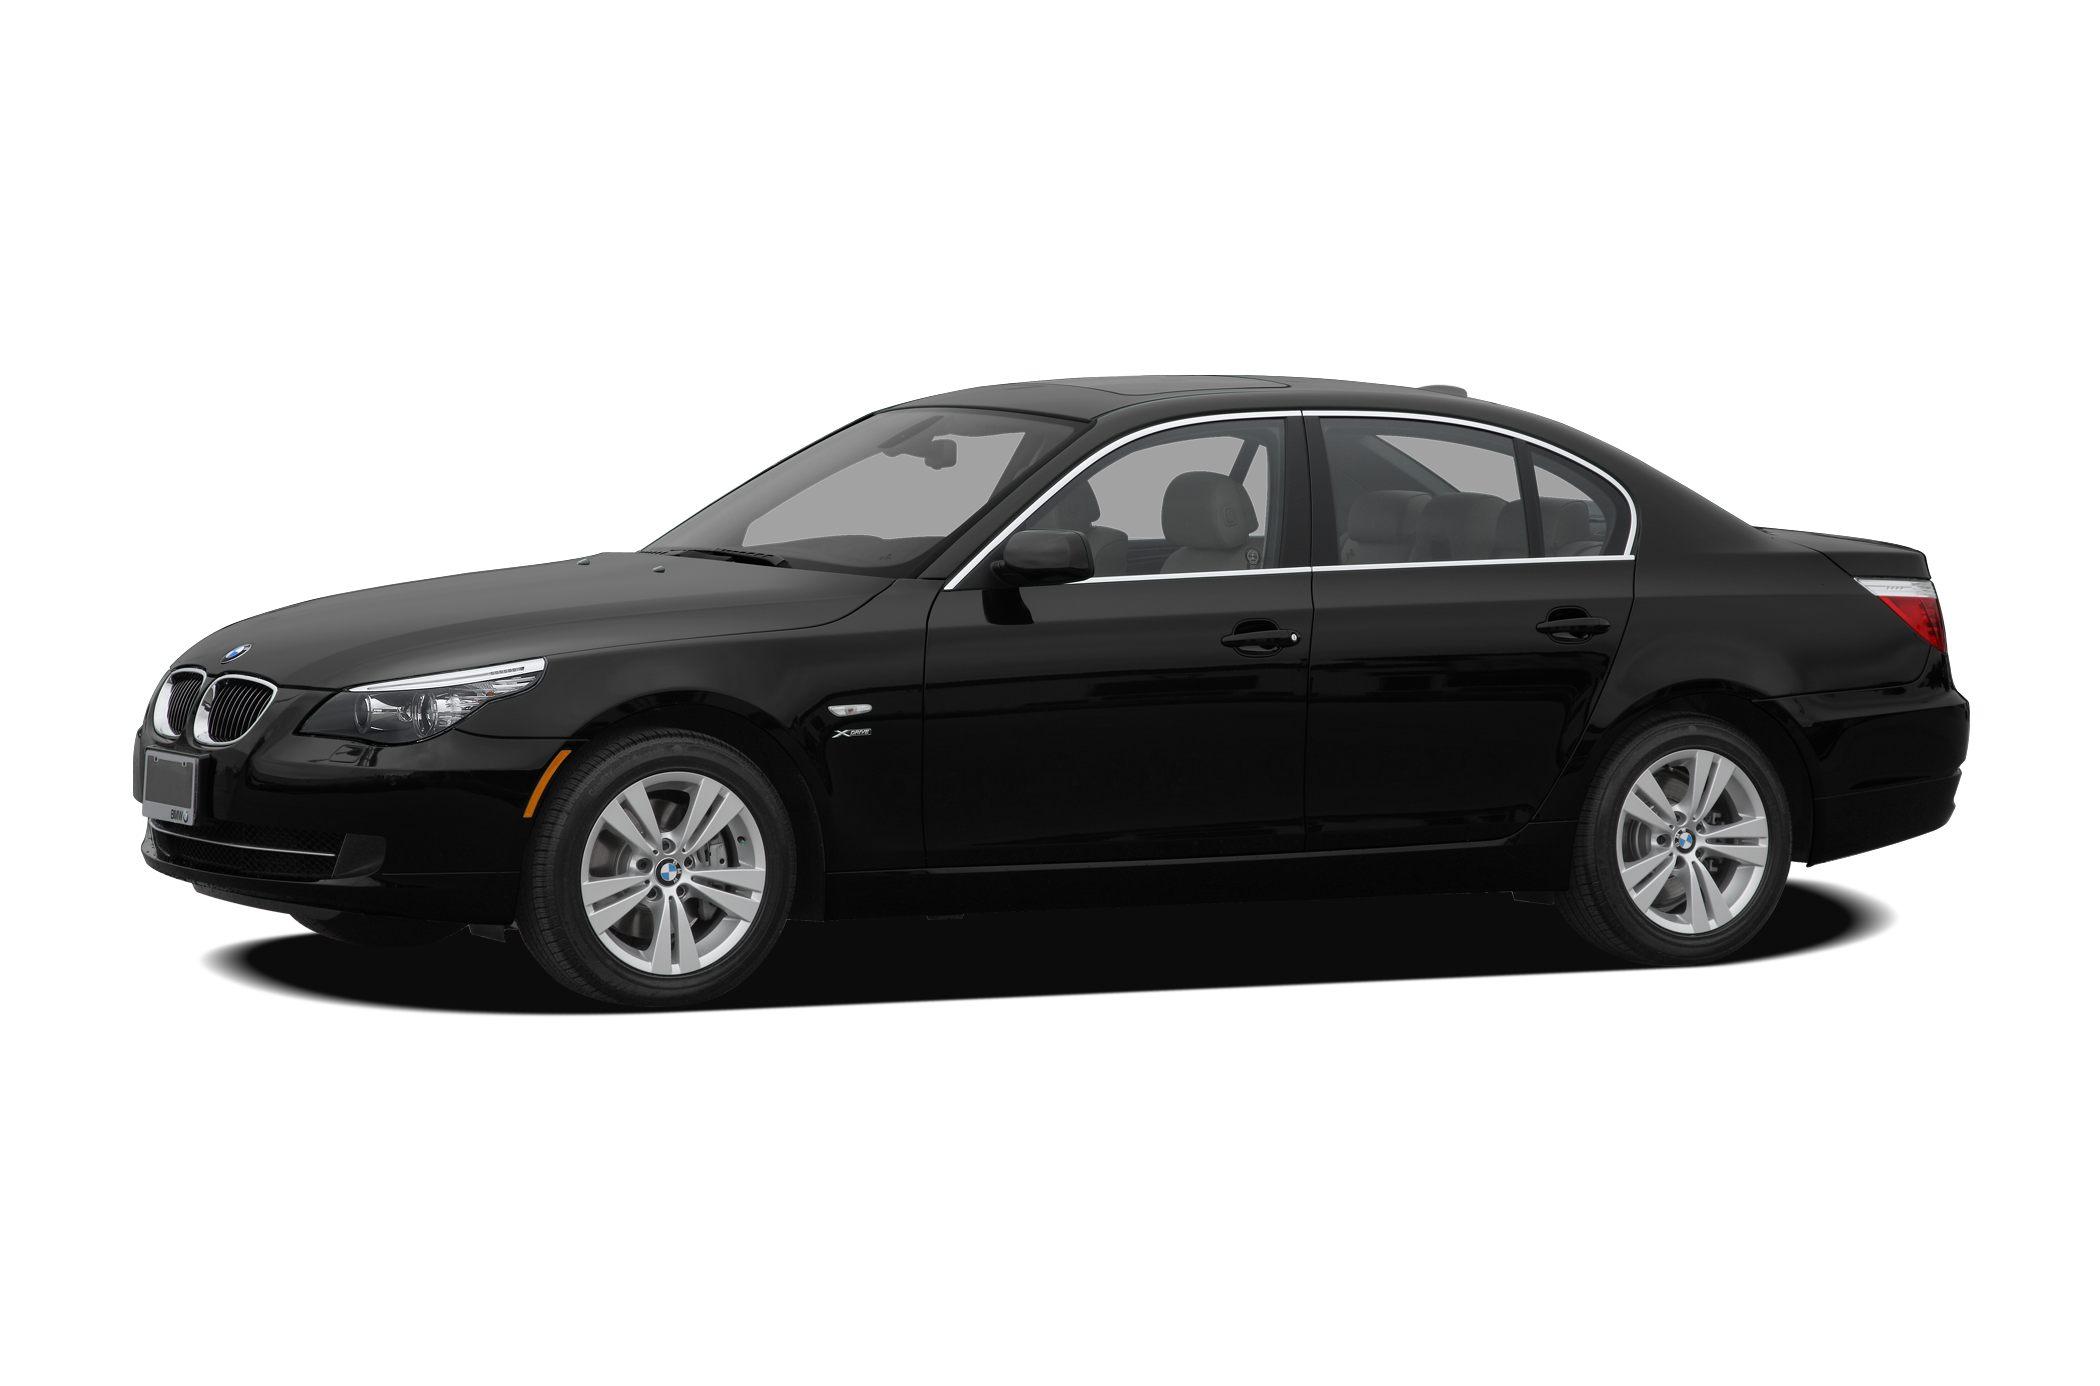 2009 BMW 535 Information